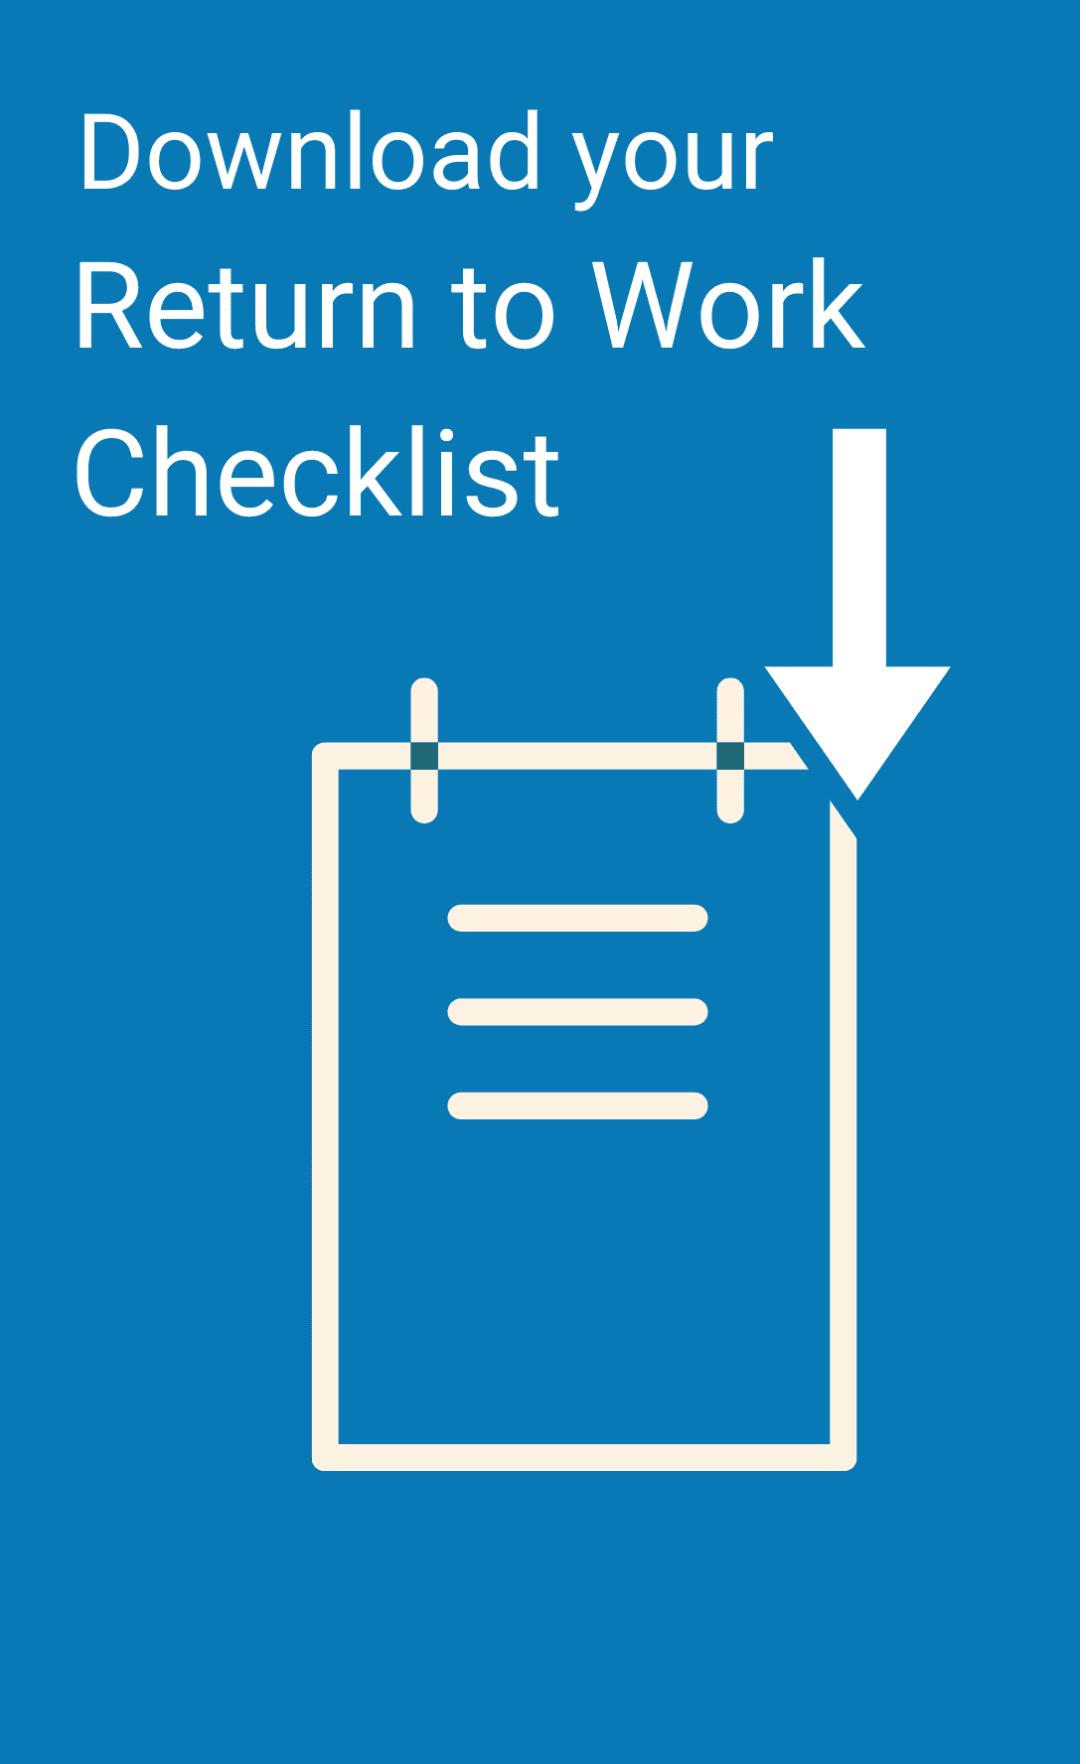 Download your Return to Work Checklist